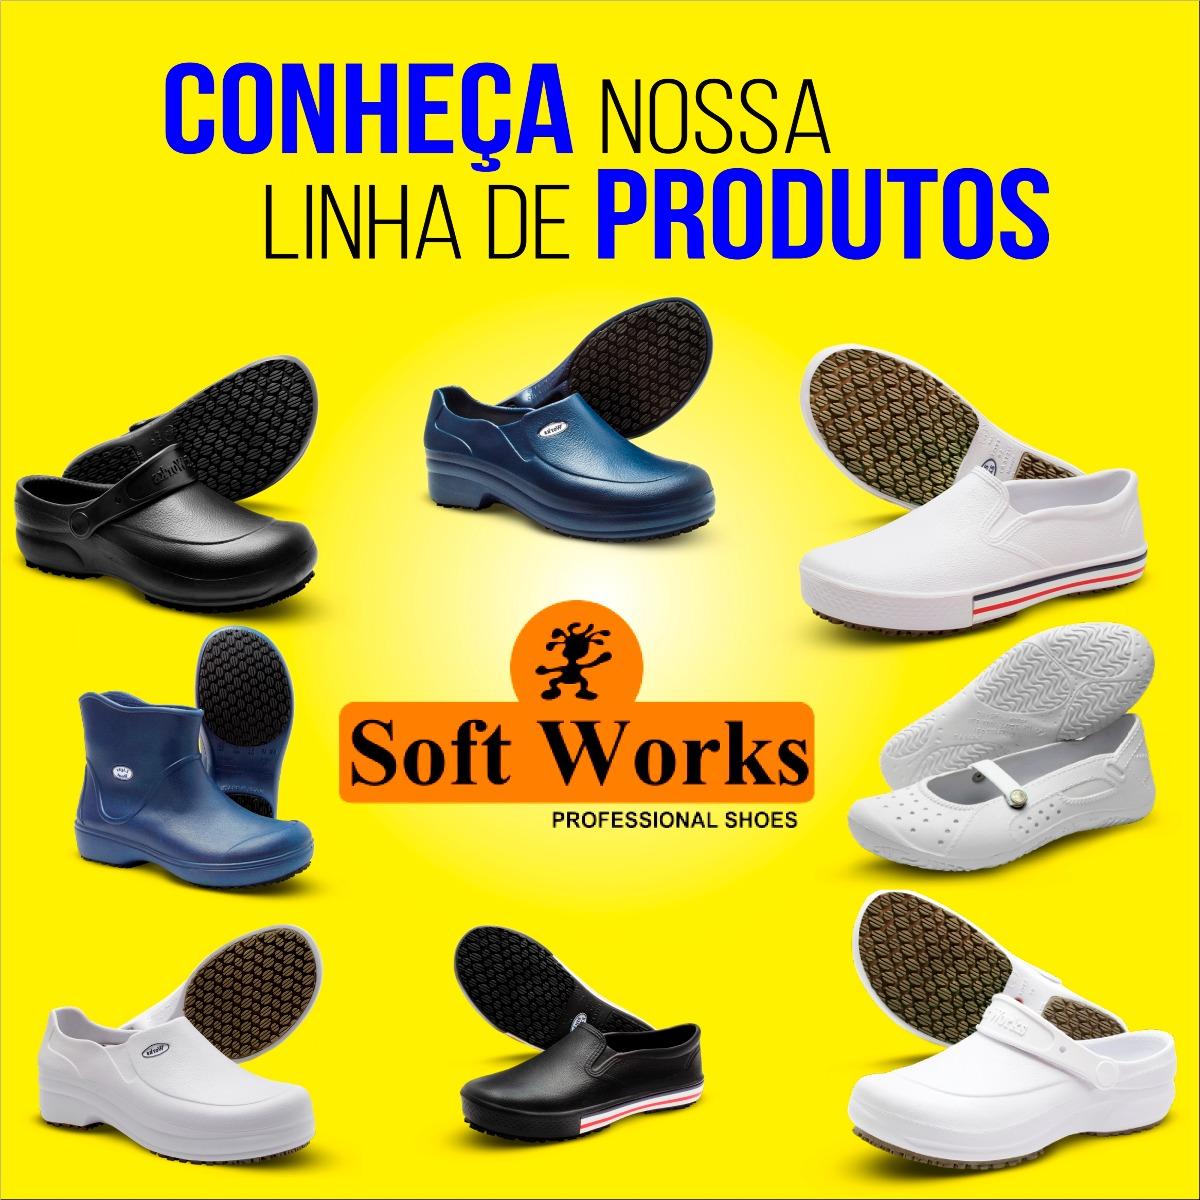 Bota Sapato Eva Cozinha Industrial Antiderrapante Ca Bb85 R 71 82